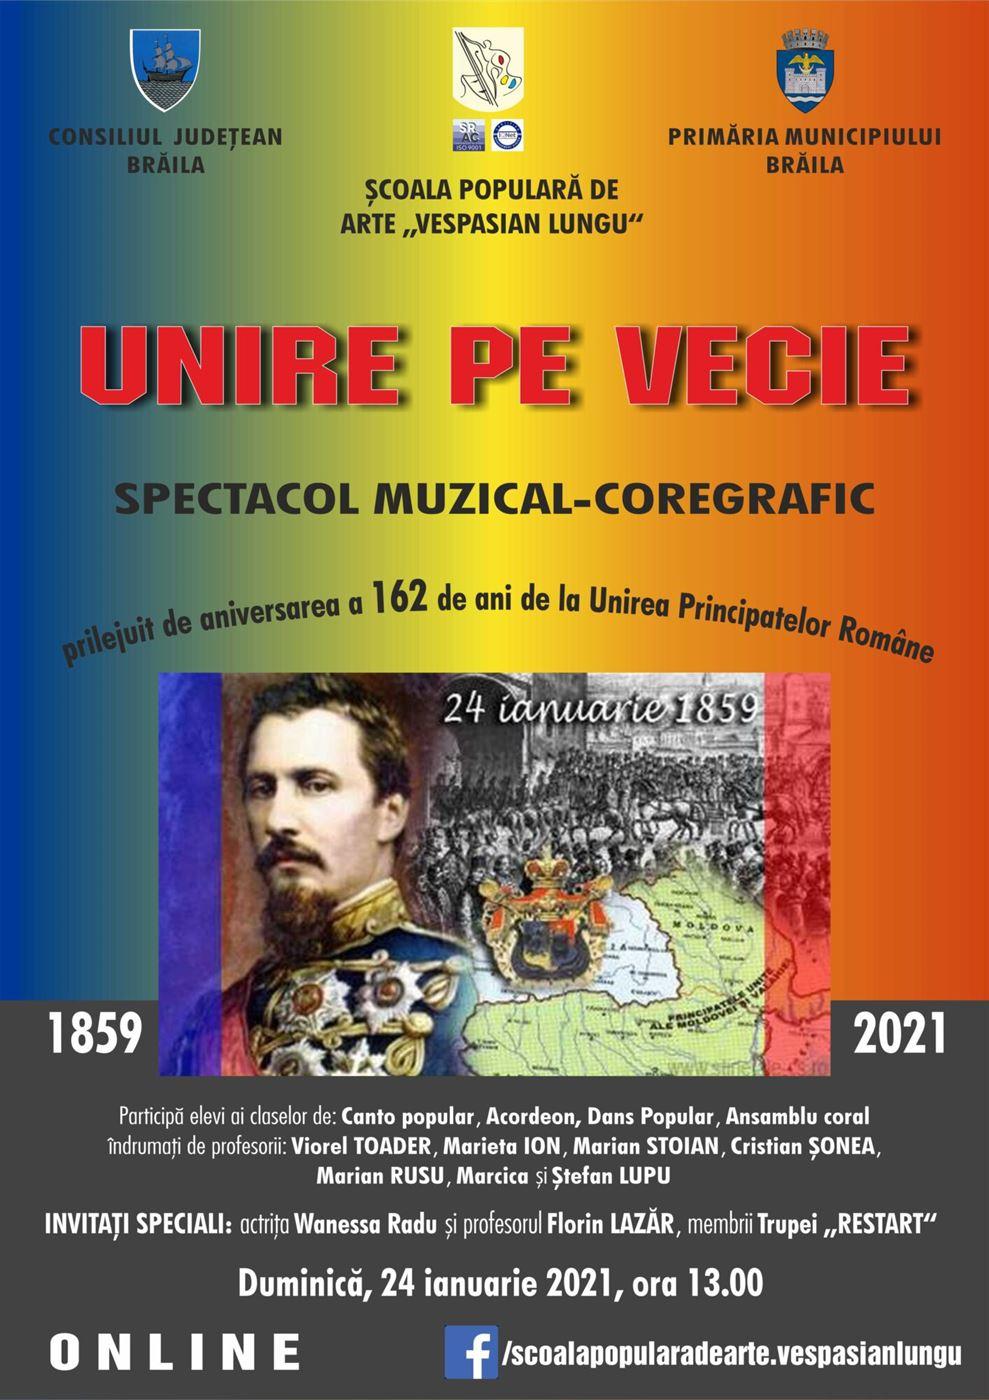 "Spectacol muzical-coregrafic ""Unire pe vecie"", transmis on-line"